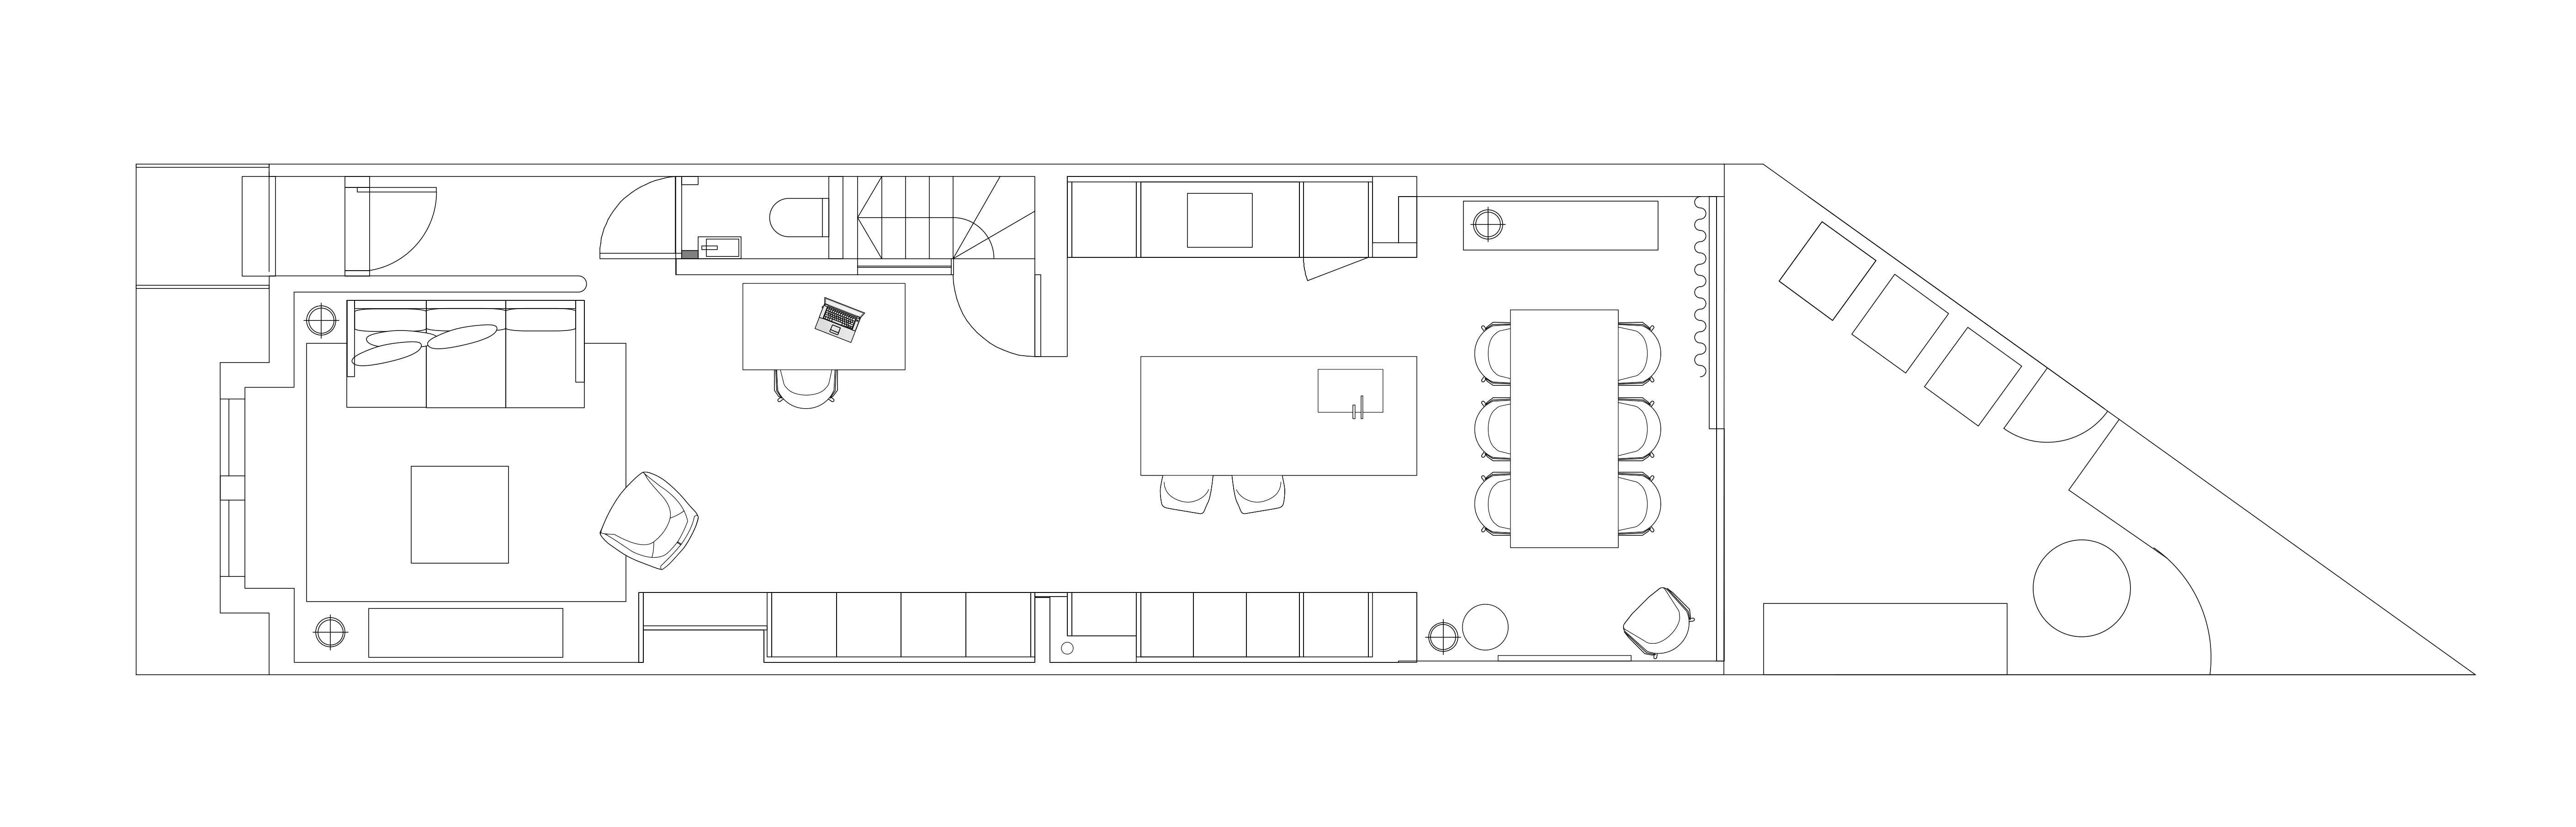 Robert London Design | Interior Design | Architectural Design | Cross Street, Barnes